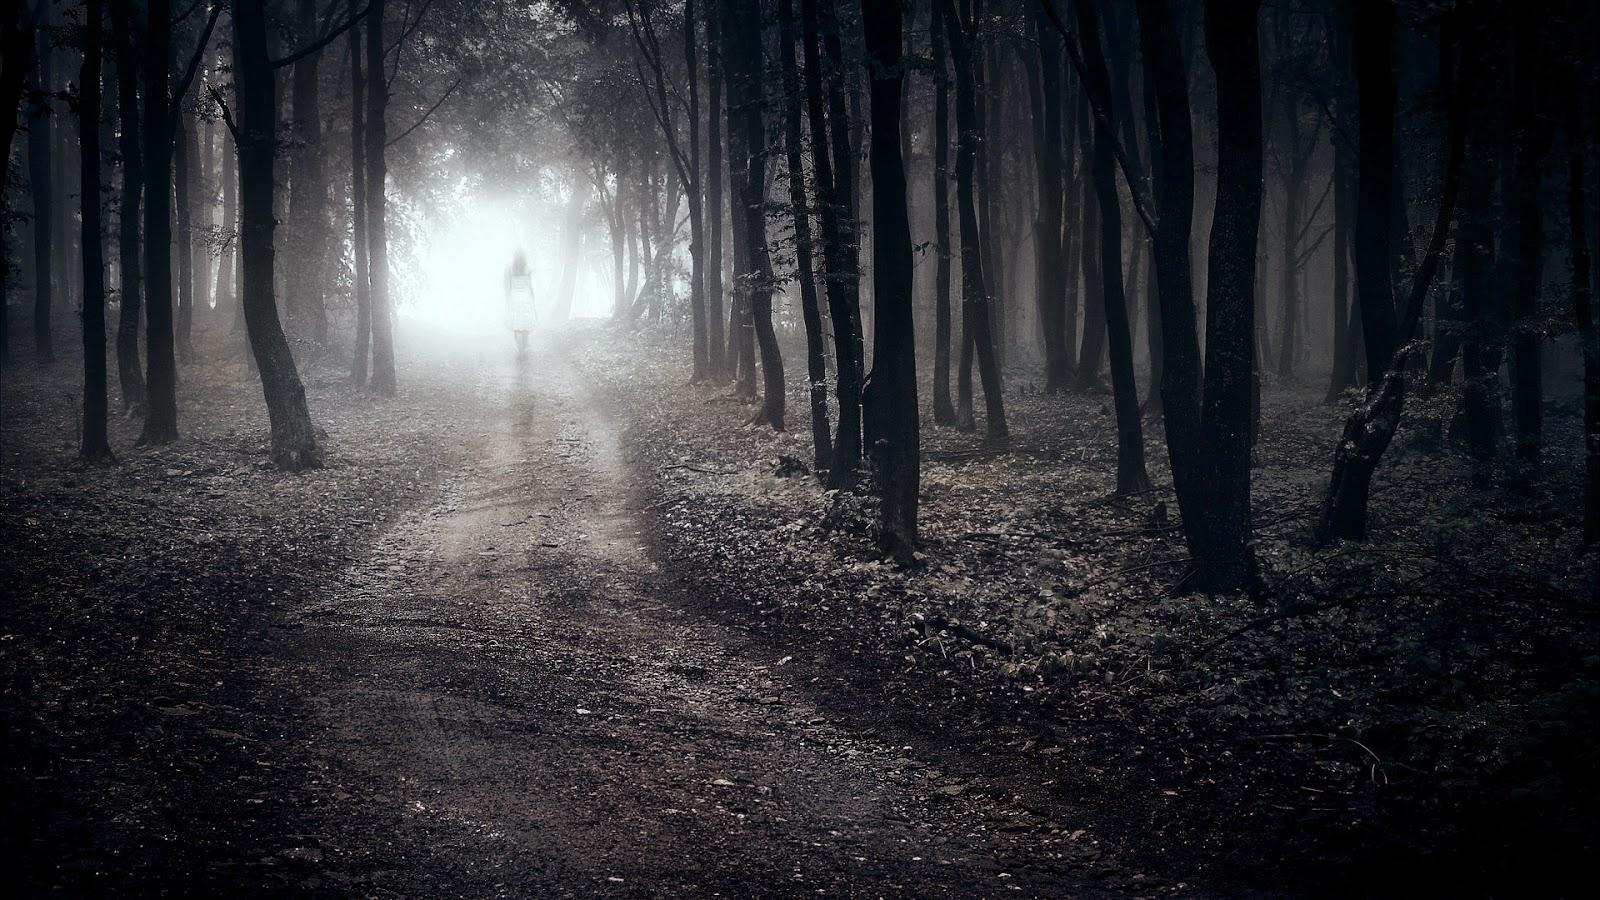 Fantastic Wallpaper Forest Girl - wallpaper-girl-walking-alone-in-forest-path-lonely-sad-1920x1080  Gallery_248540 .jpg?ssl\u003d1